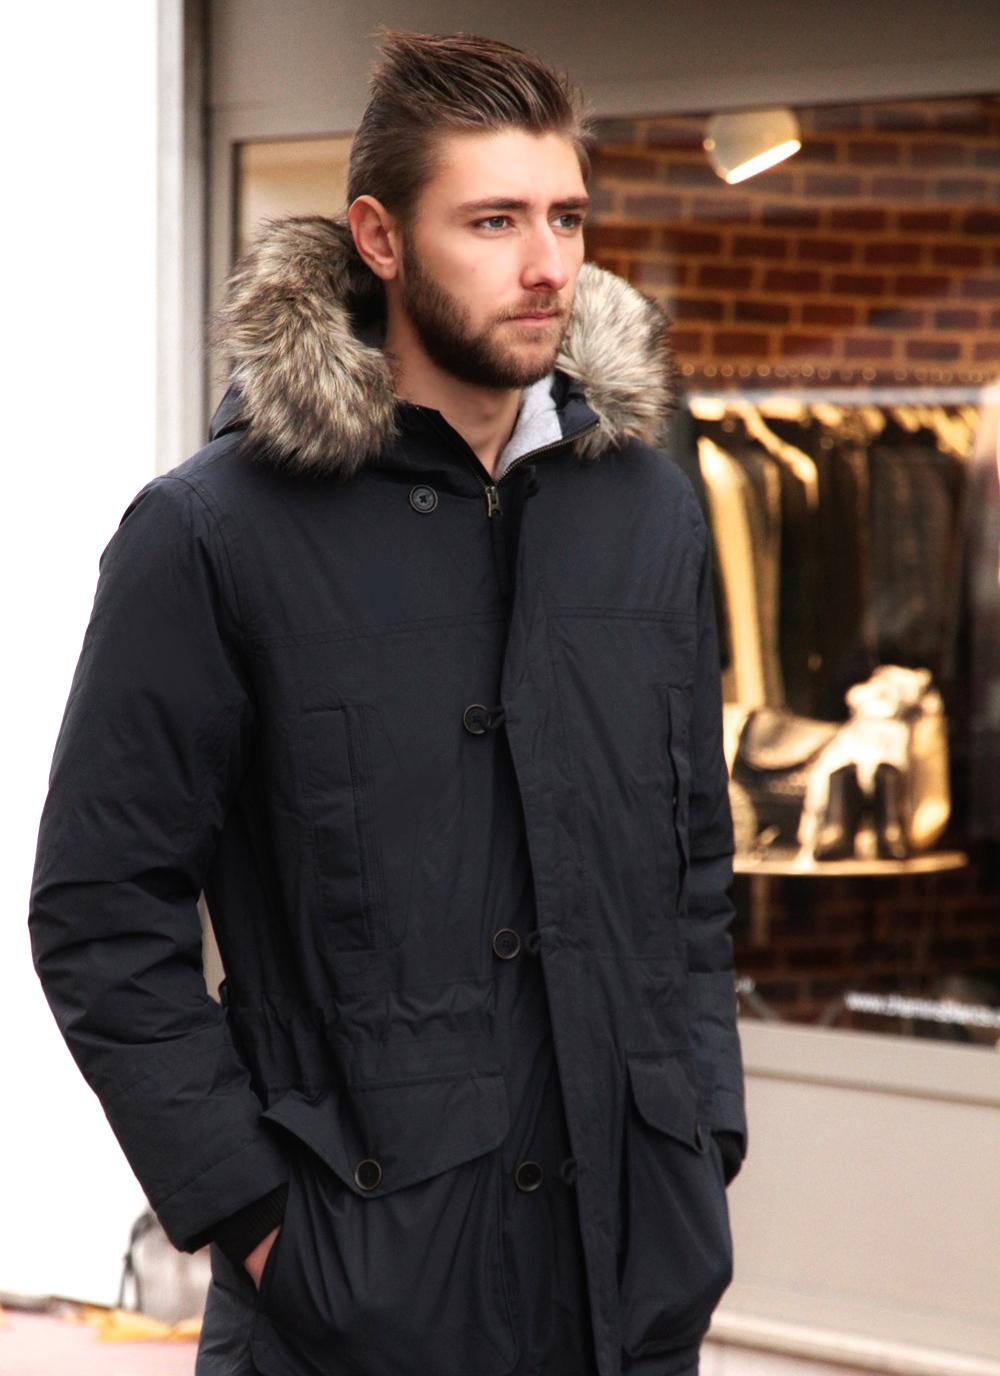 timberland manteau acheter flotte shox nike. Black Bedroom Furniture Sets. Home Design Ideas